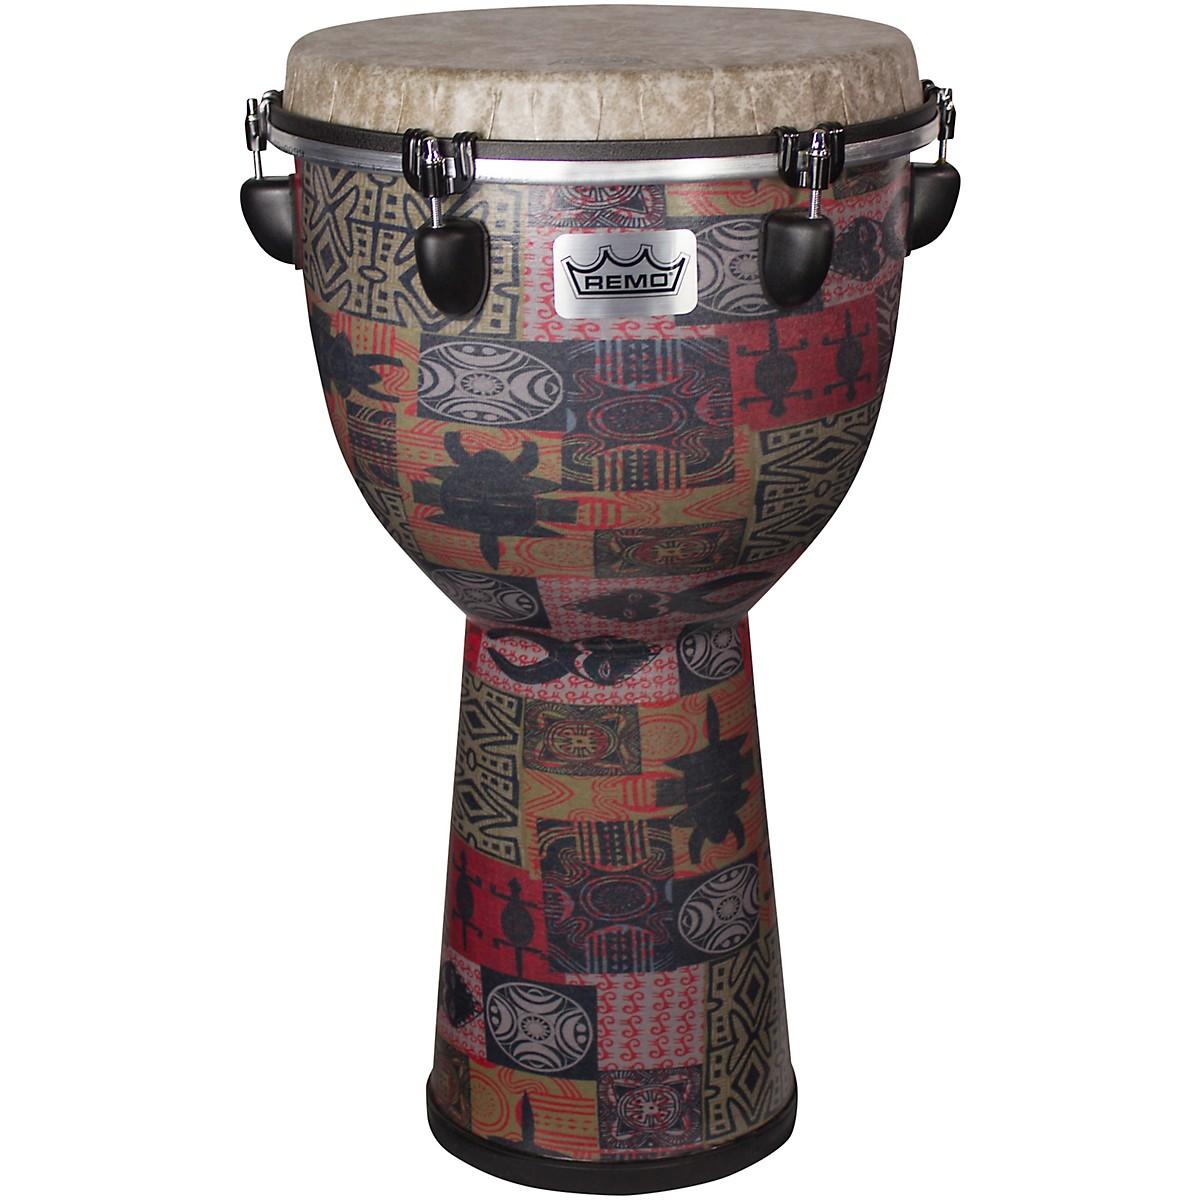 Remo Apex Djembe Drum